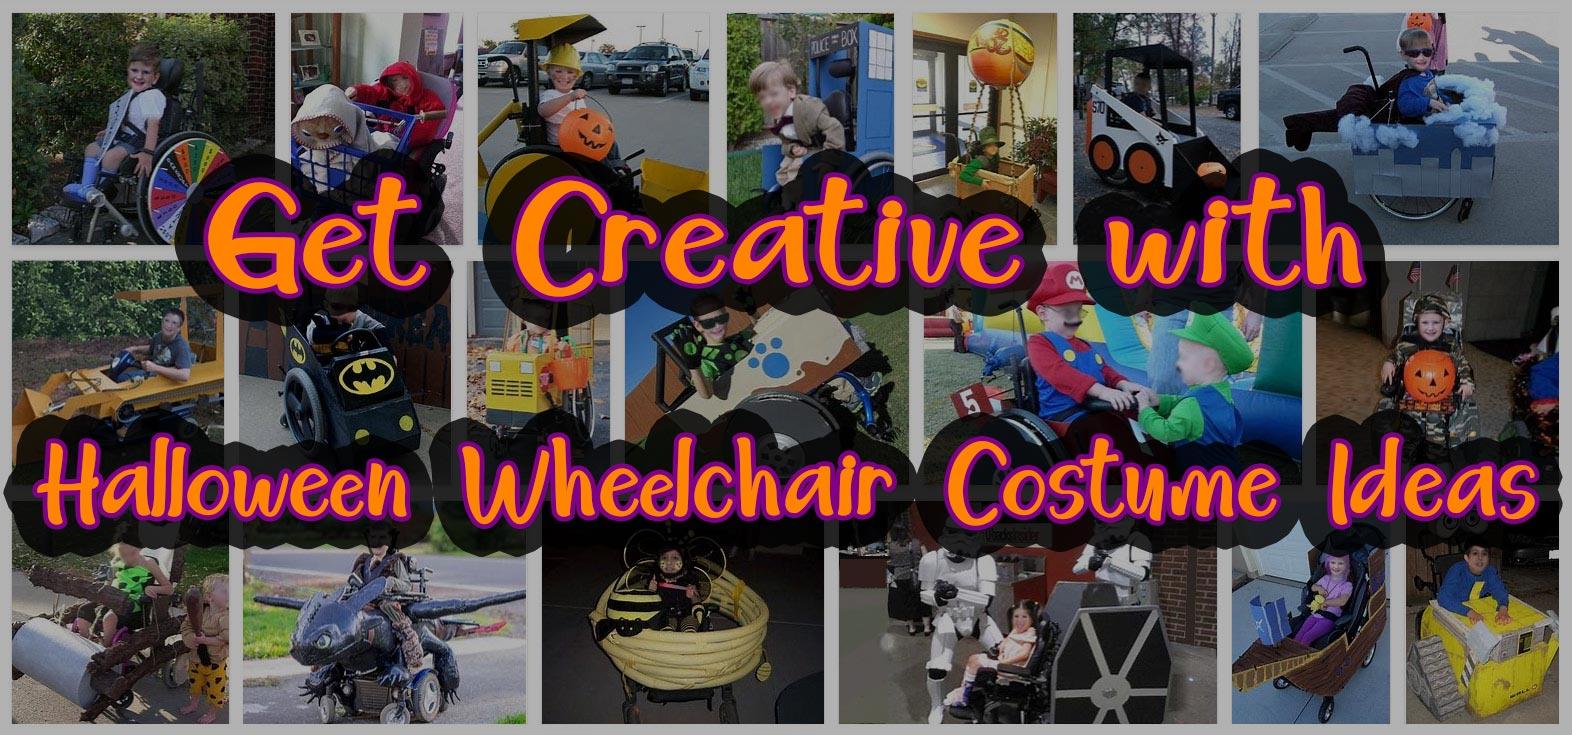 Wheelchair Halloween Costume Ideas & Tips for Inclusivity